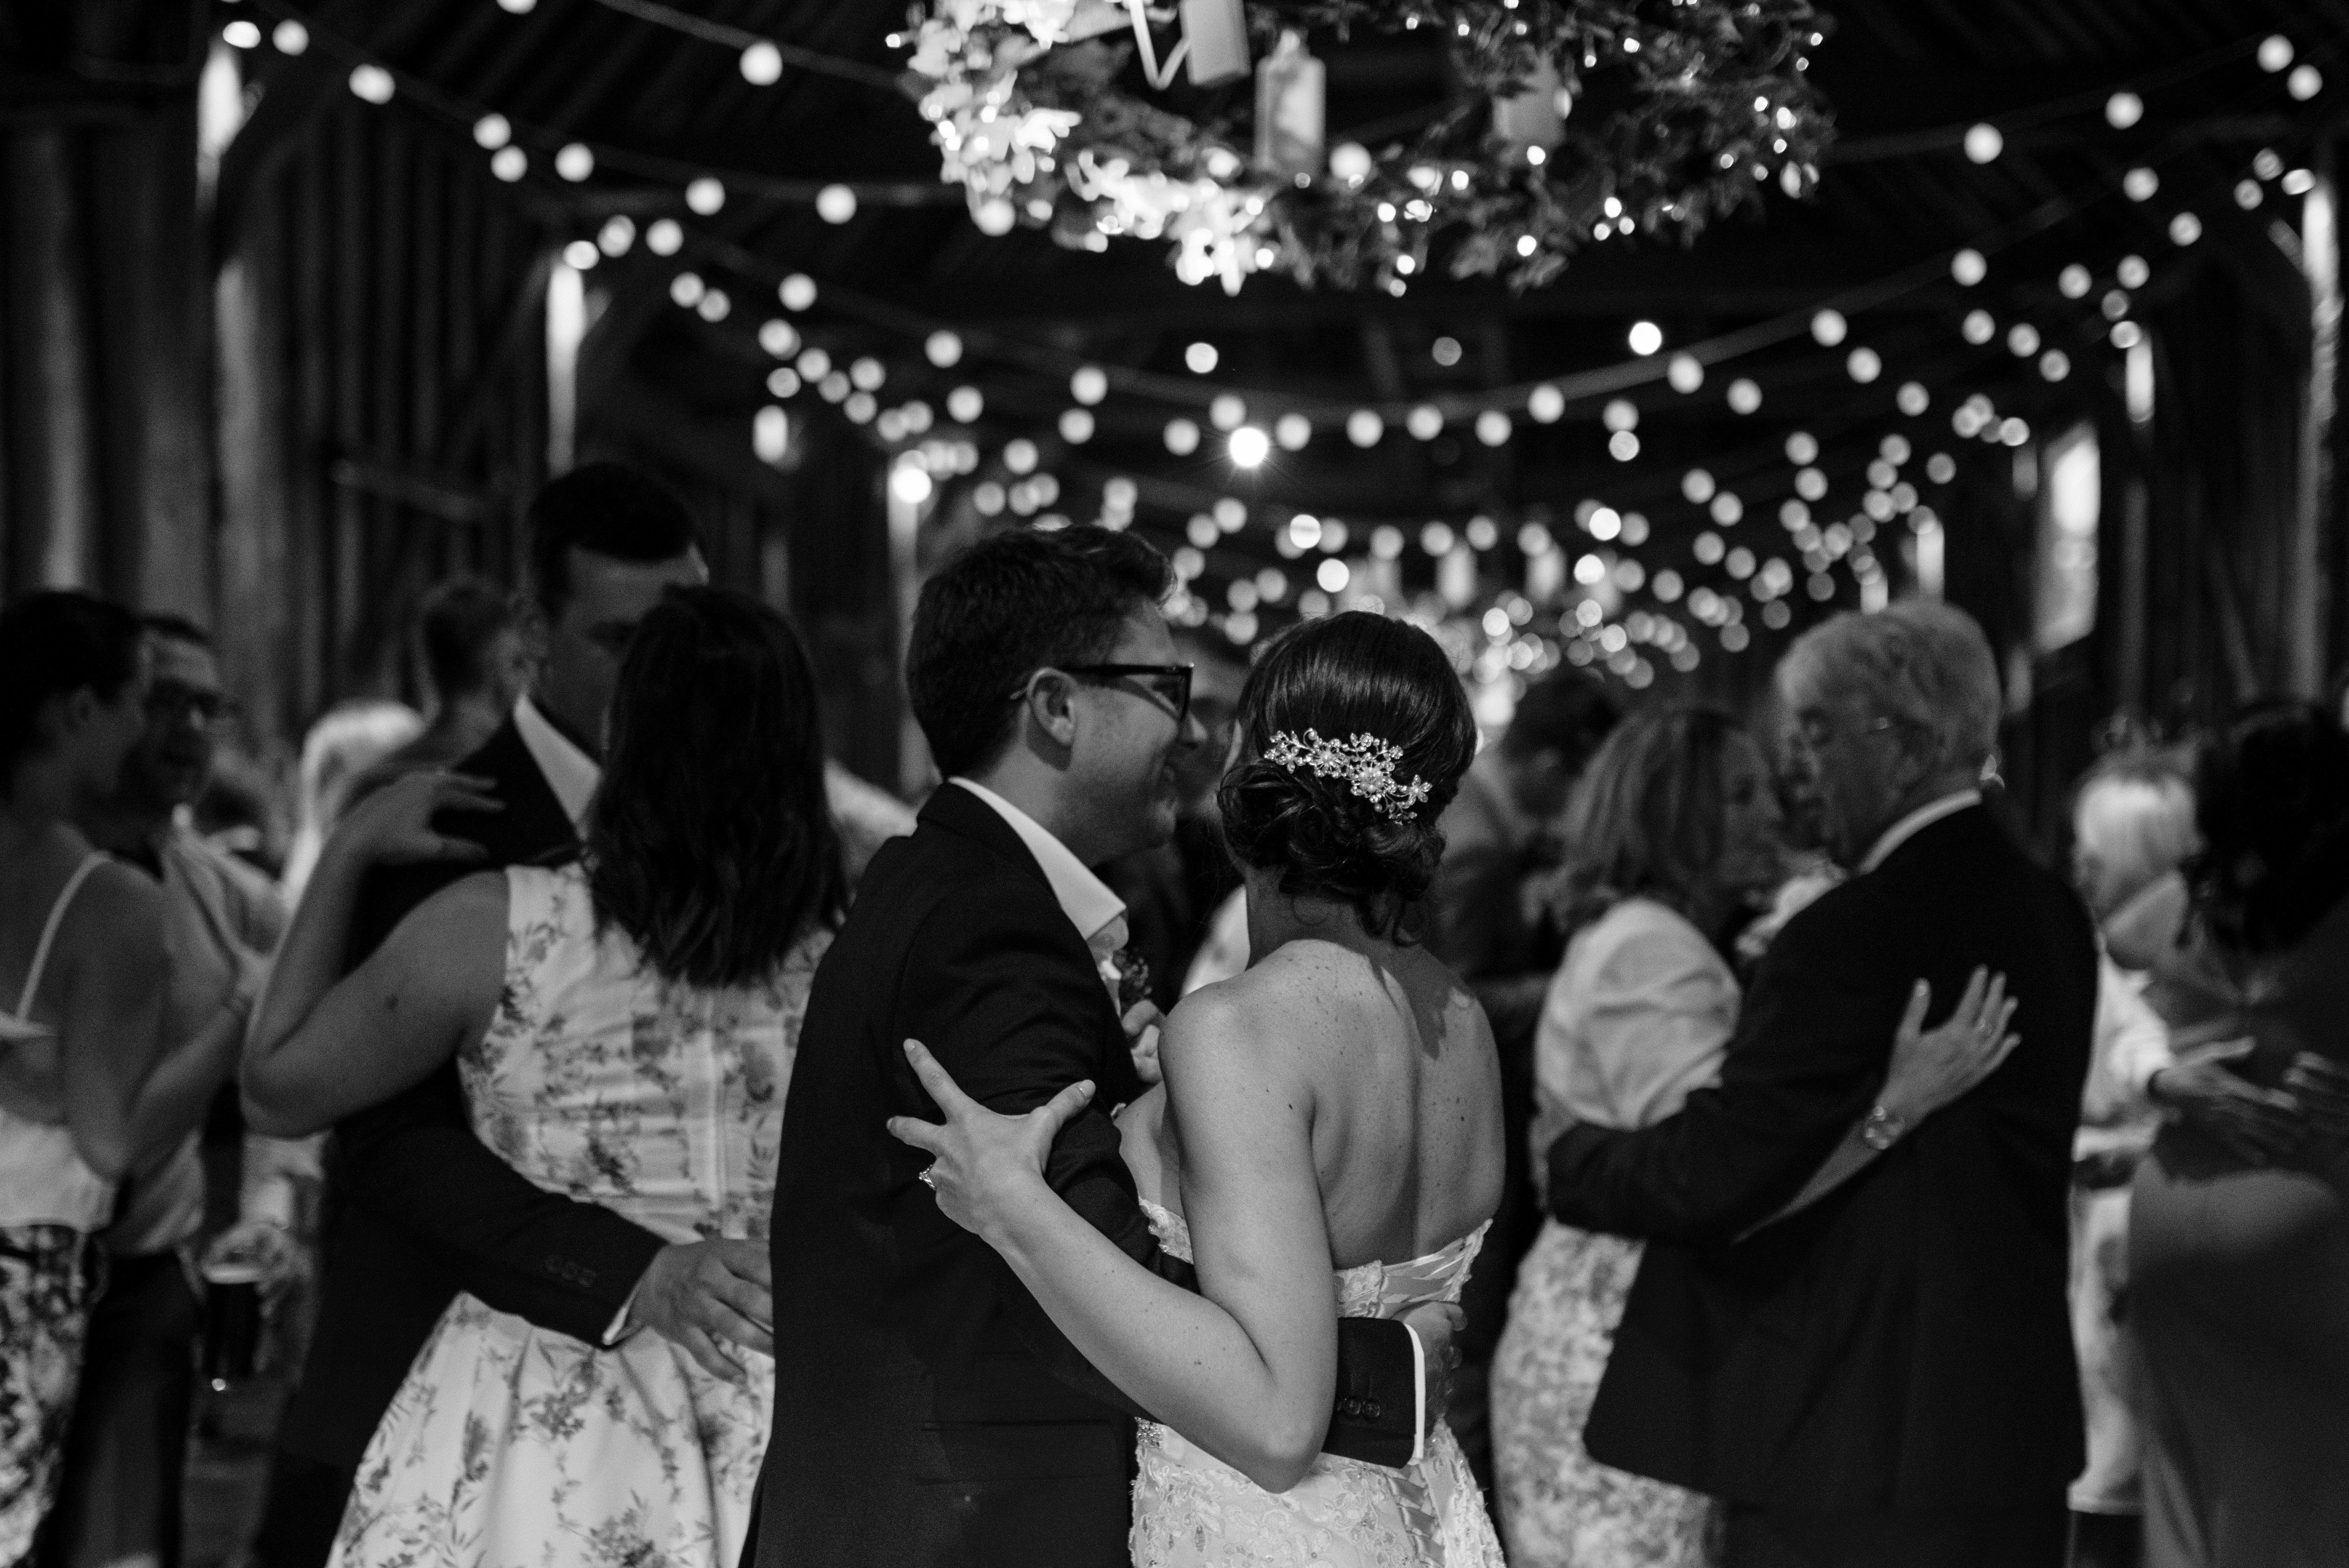 Hannah McClune Photography. The slow dance.